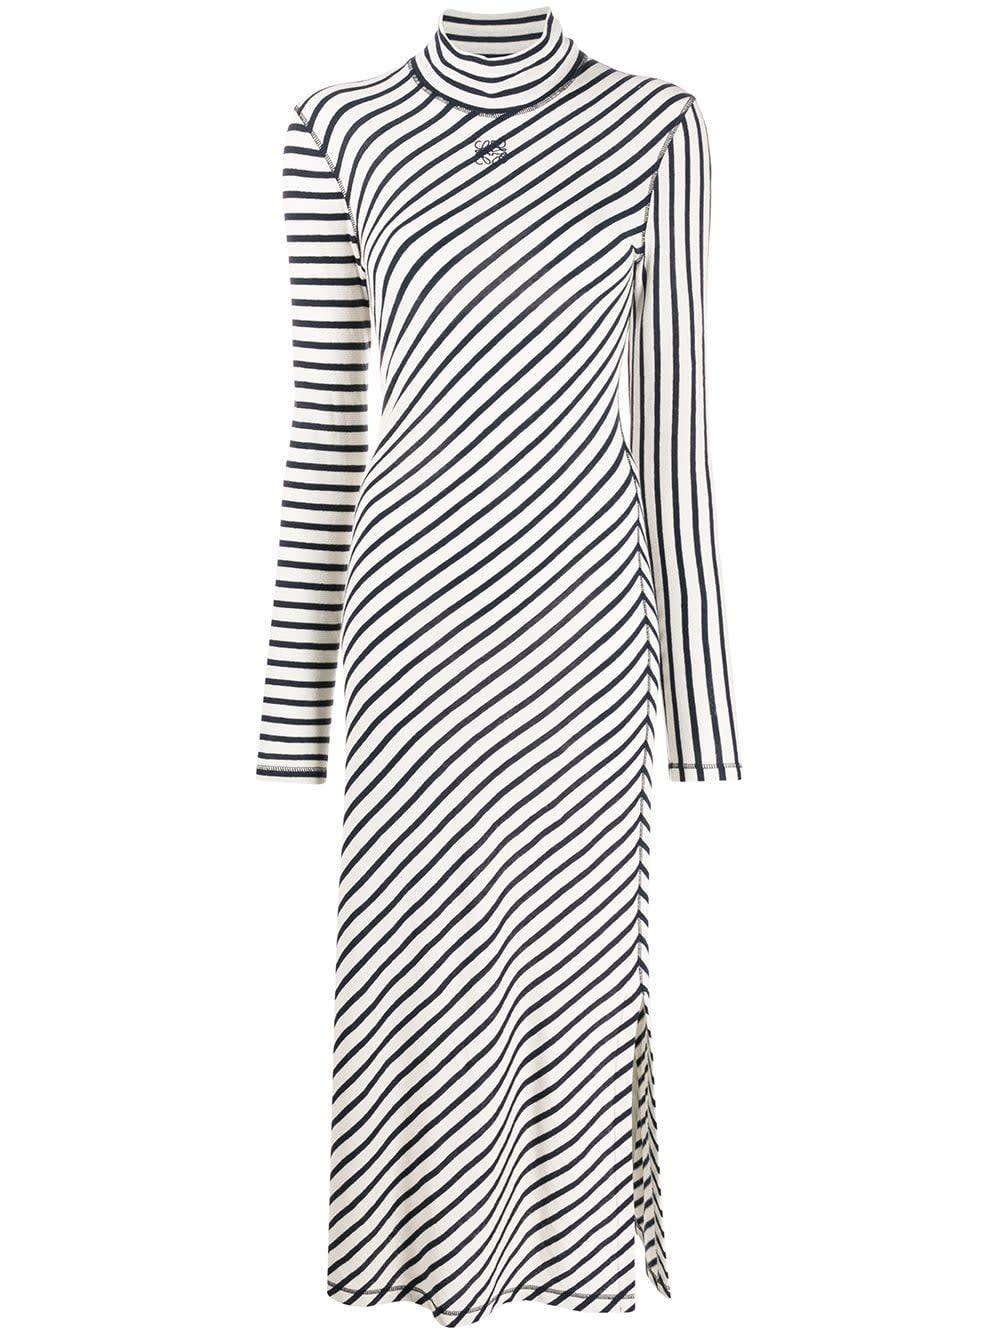 Loewe Jersey Dress